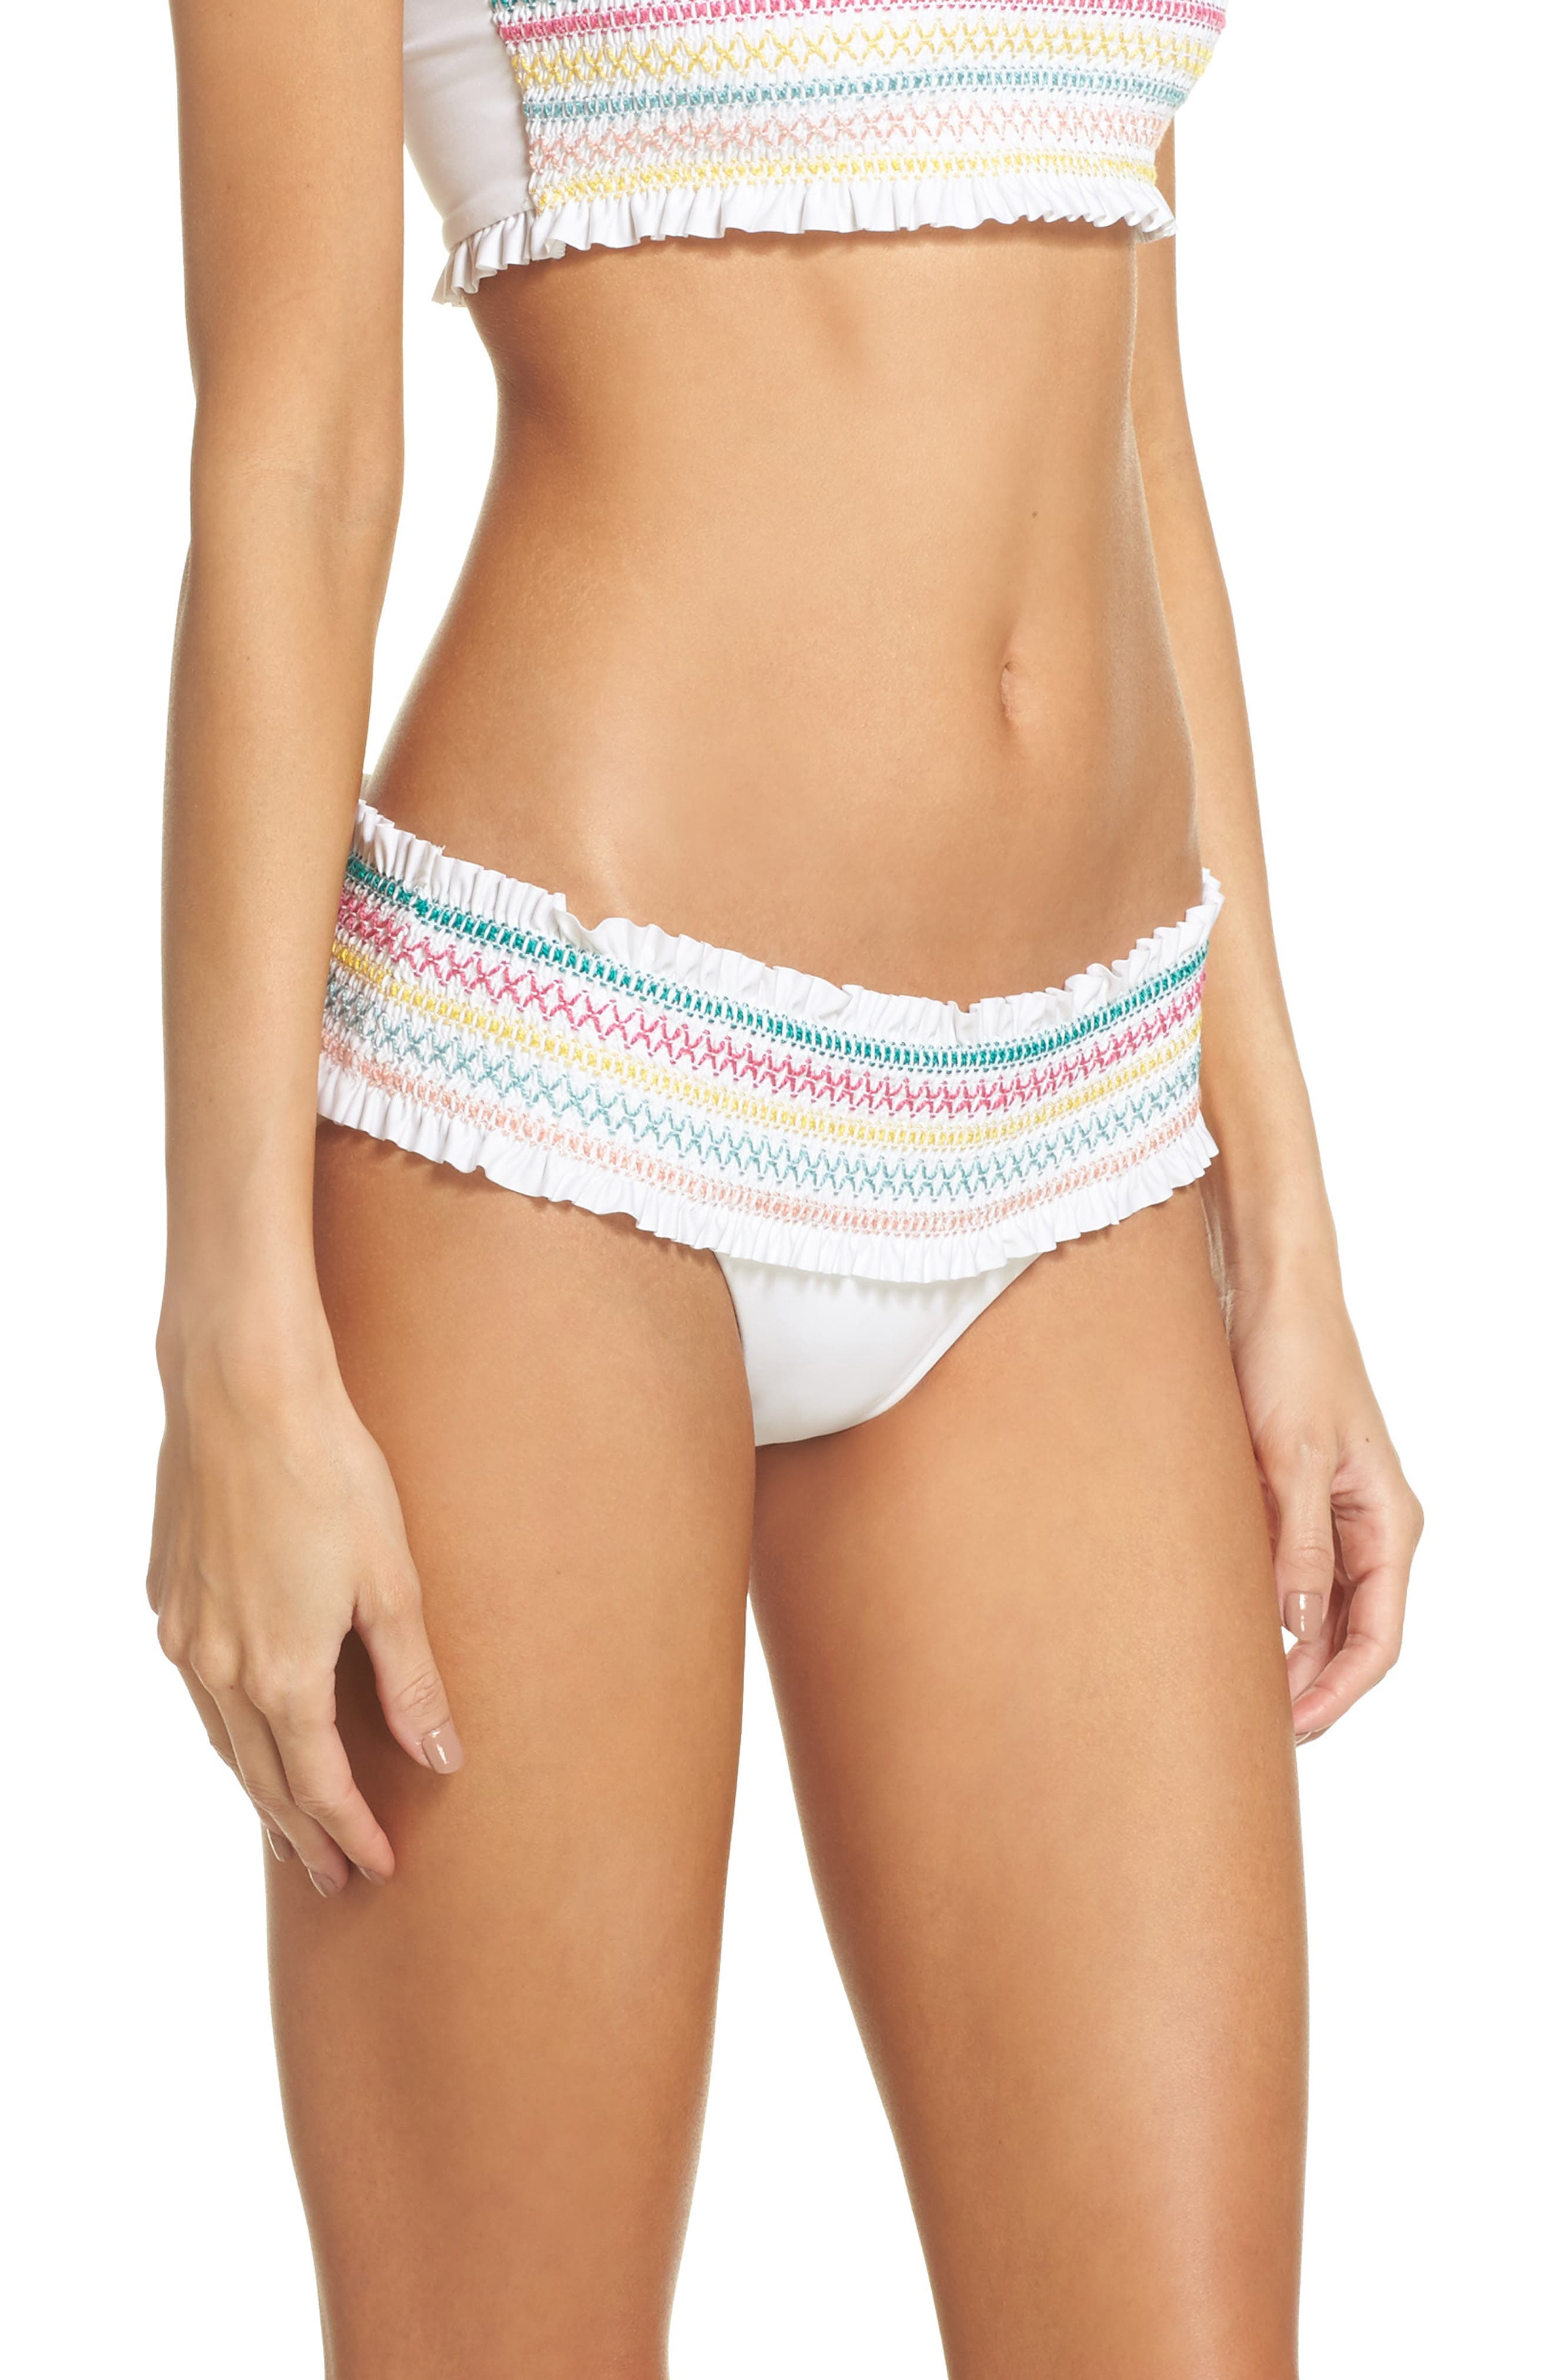 Crystal Cove Smocked Bikini Bottoms,                             Alternate thumbnail 3, color,